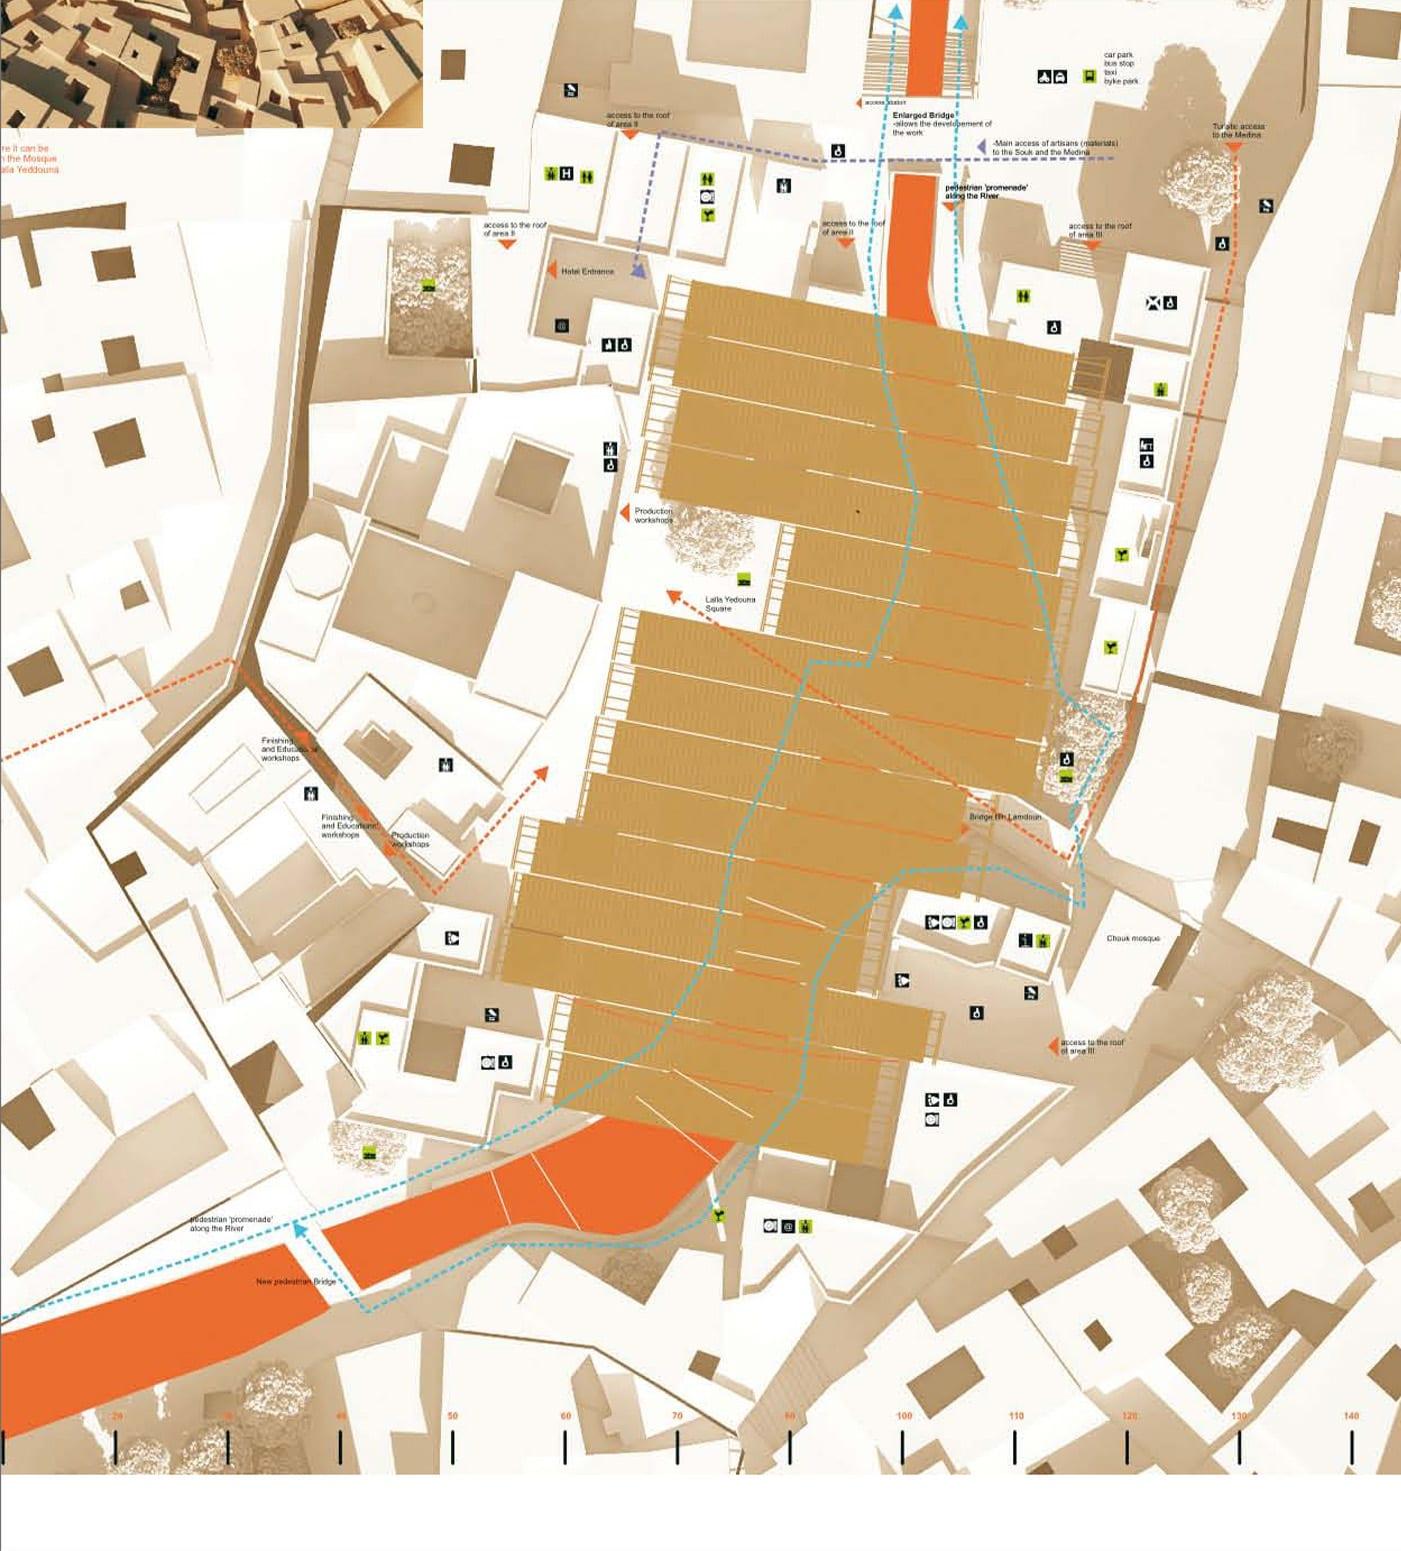 fes_site_plan_5002_arquivio_arquitectura_taoufik_el_oufir_architectes